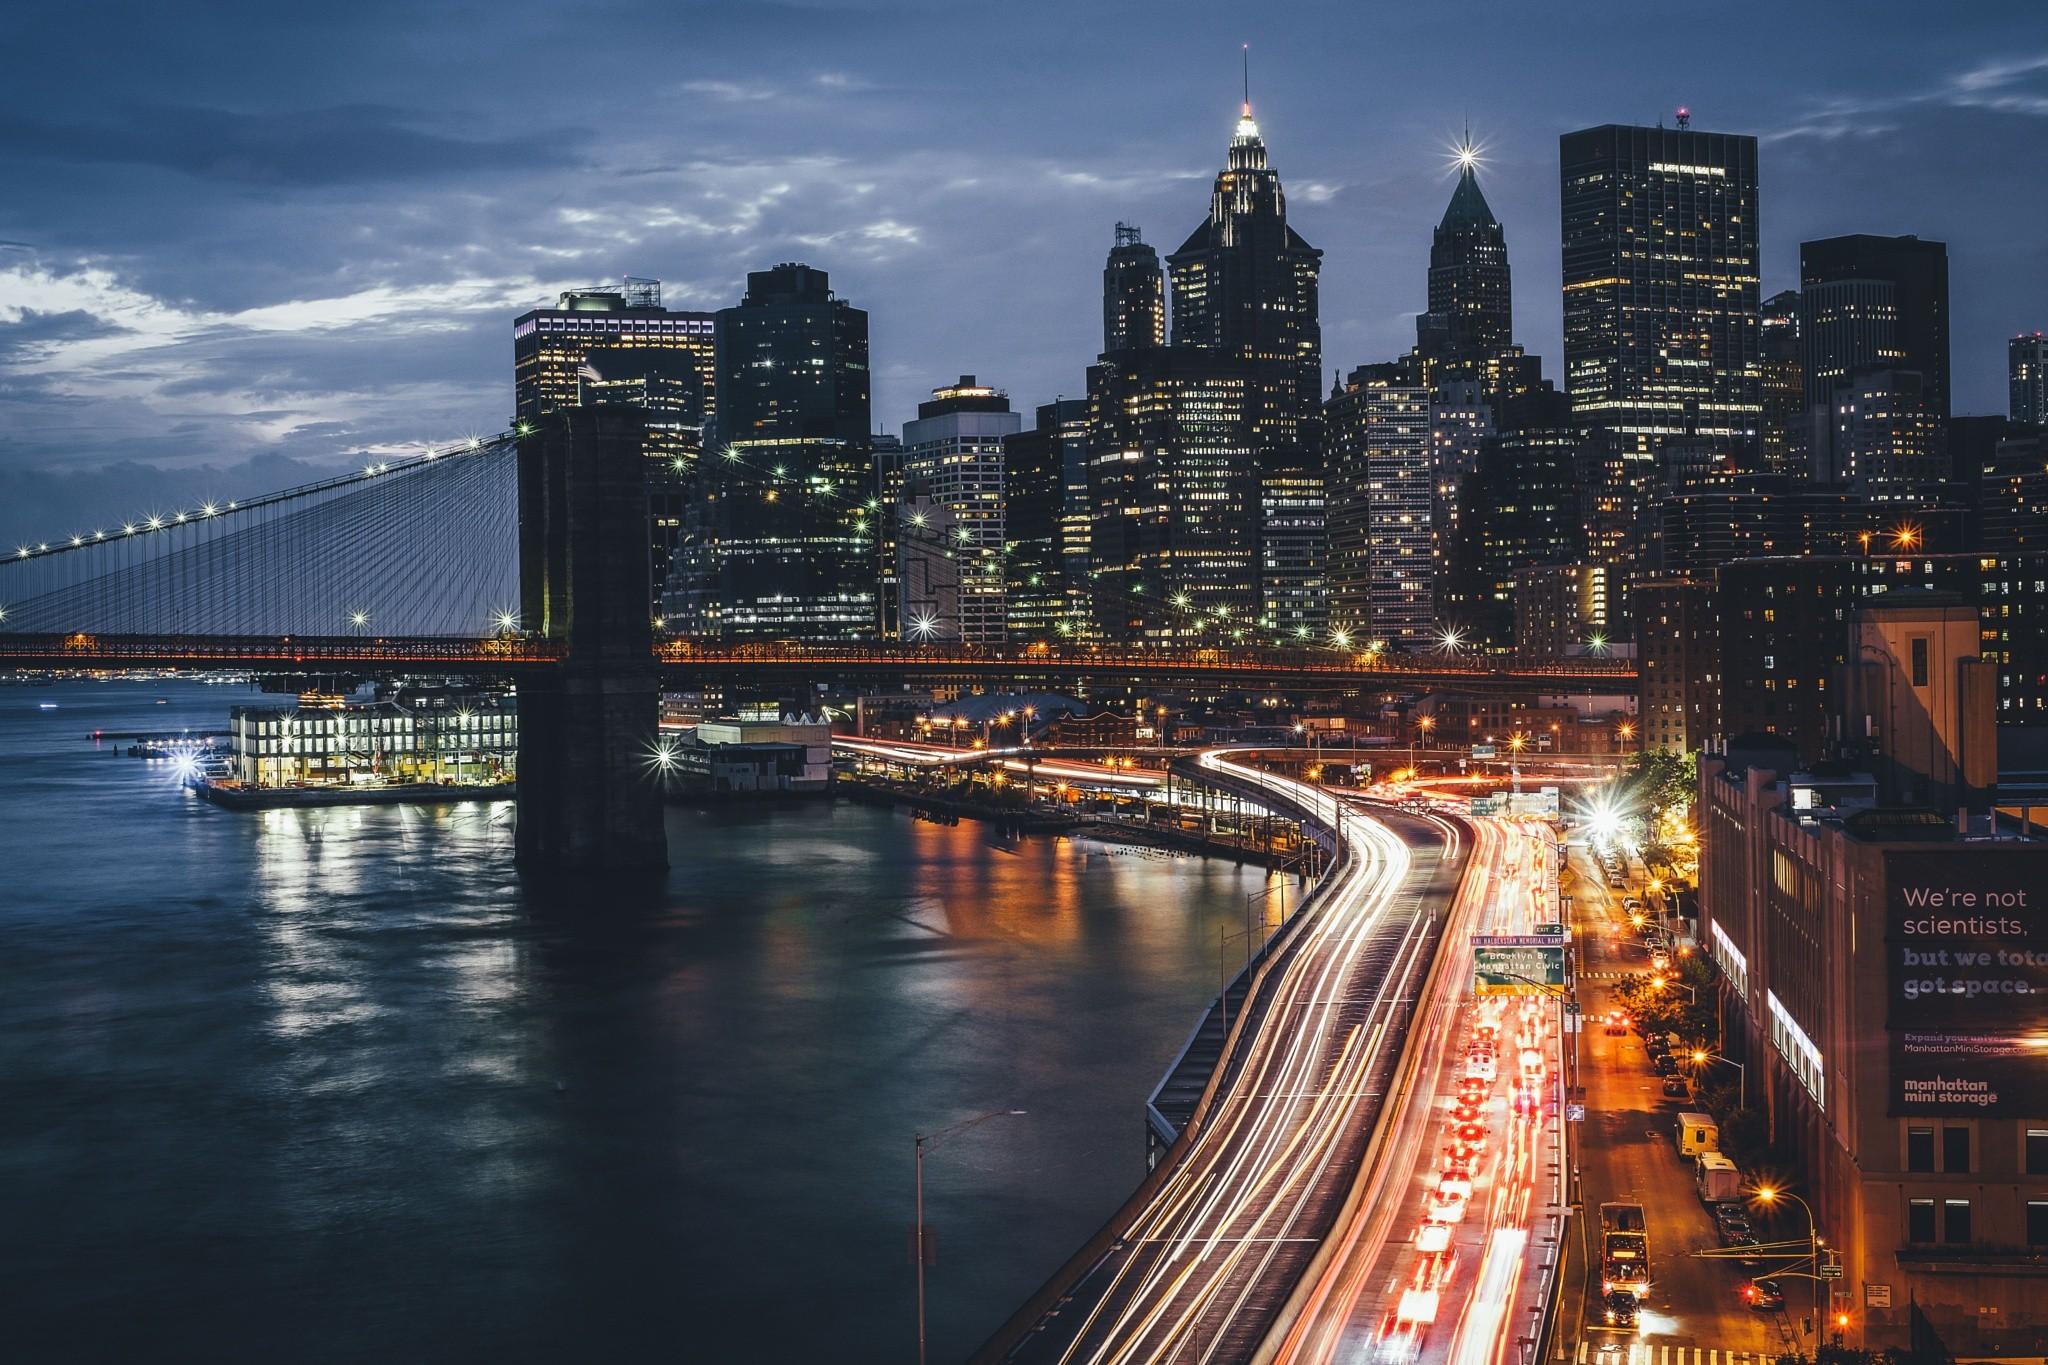 Wallpaper Lights City Cityscape Night Reflection